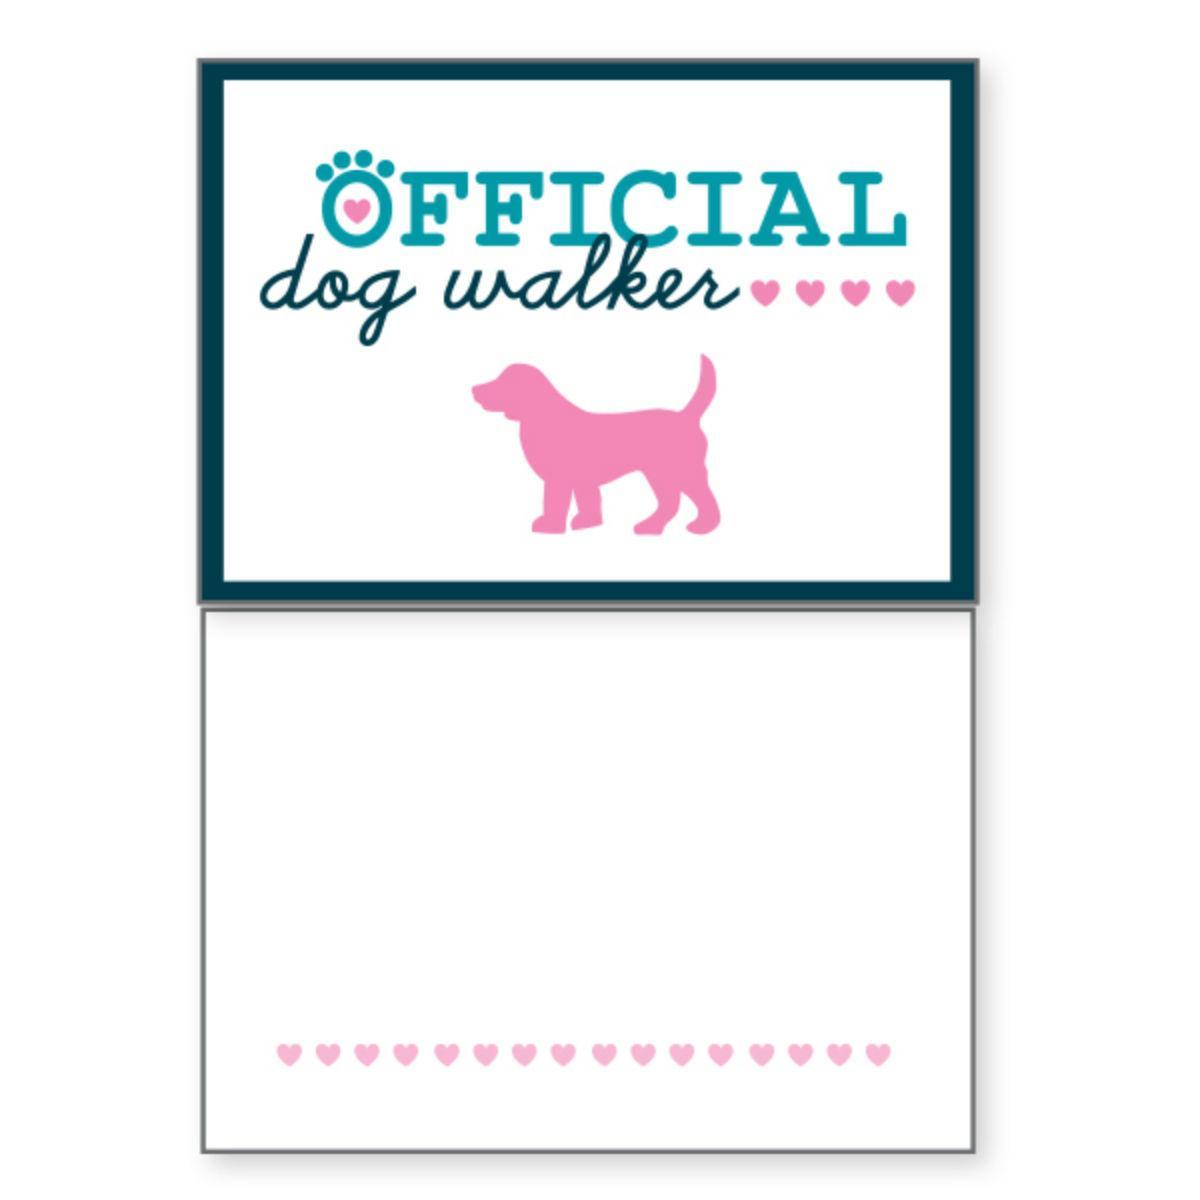 Blank Greeting Card by Dog Speak - Official Dog Walker